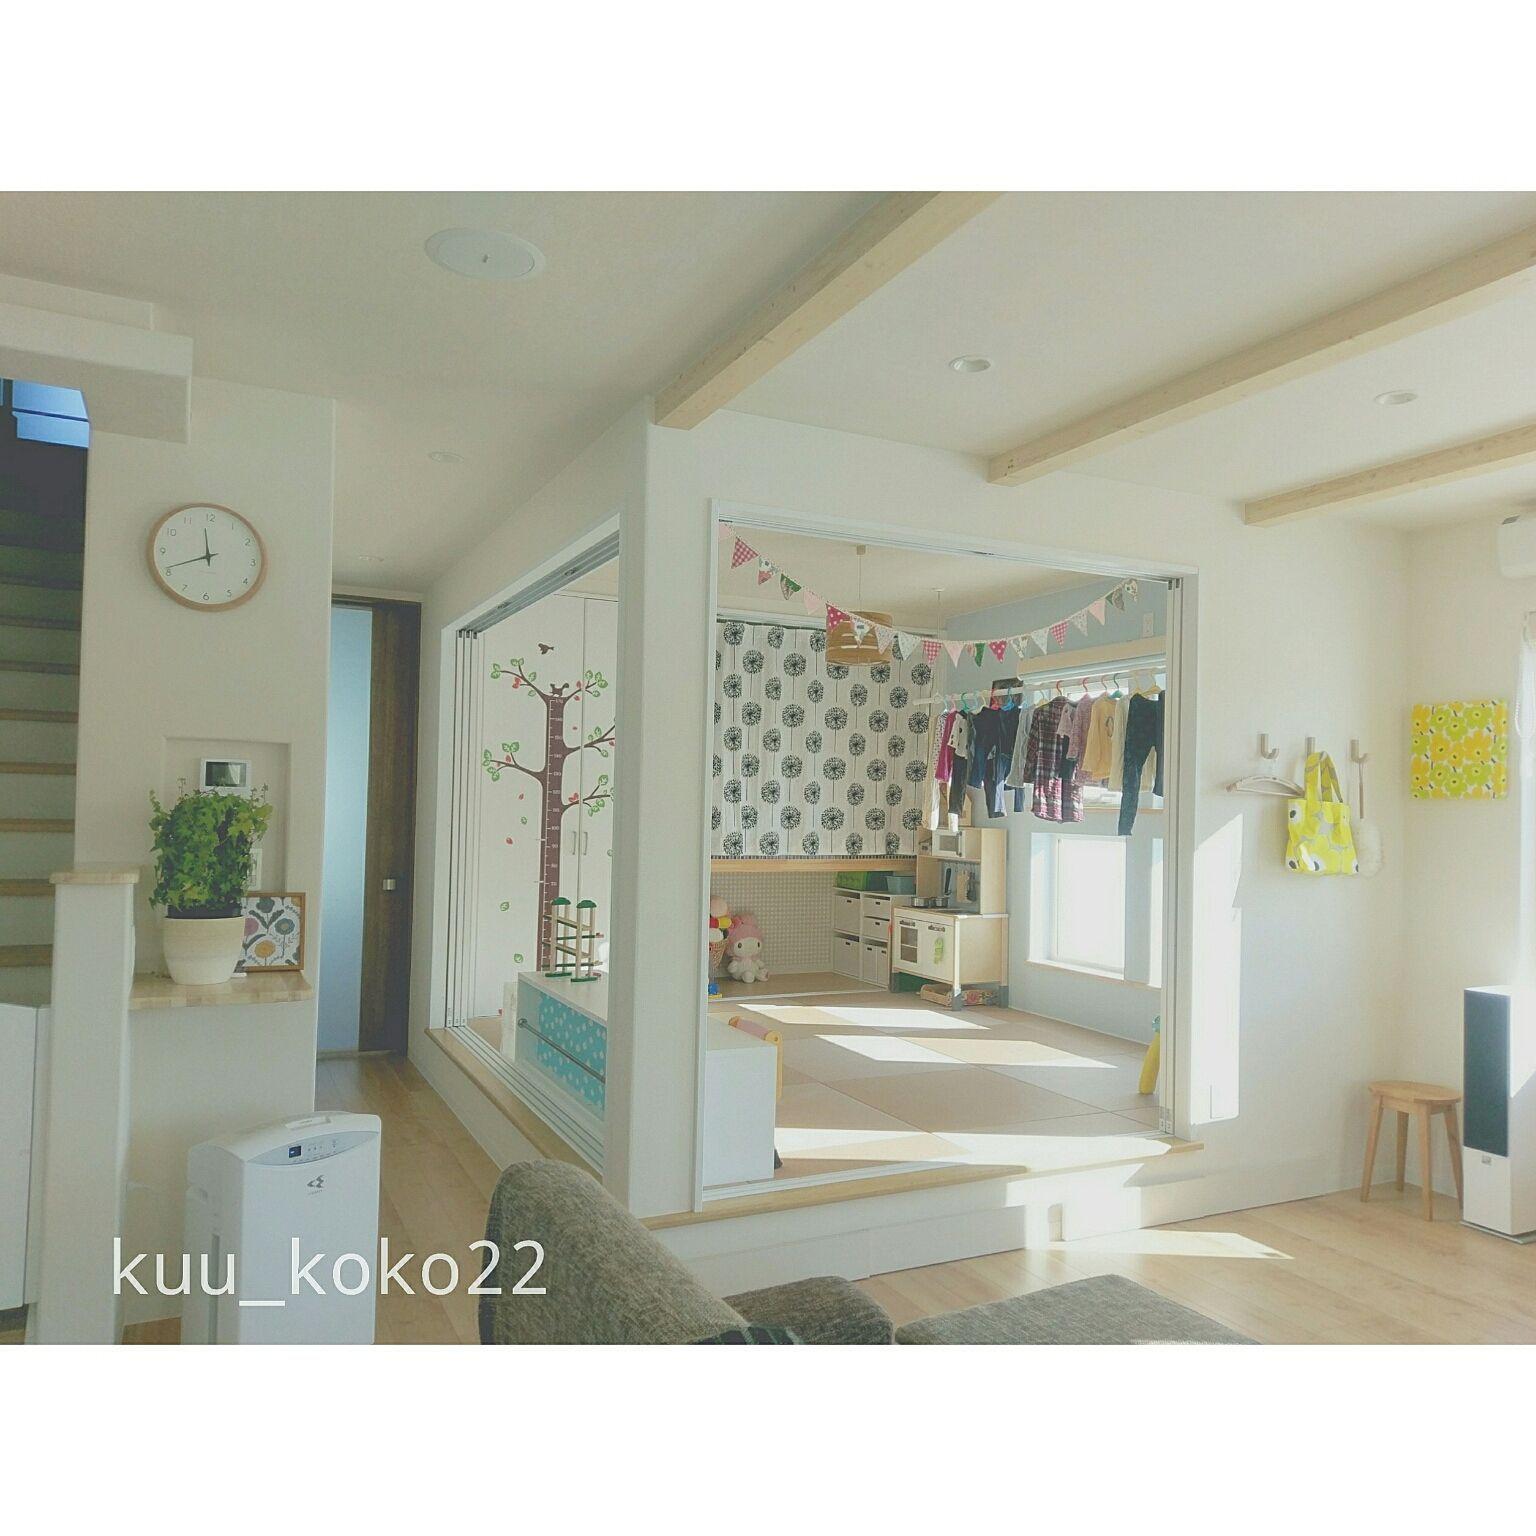 buy online e3a1c 21bbb 部屋全体/Myhome/こどもと暮らす。/新築一戸建て/marimekko ...